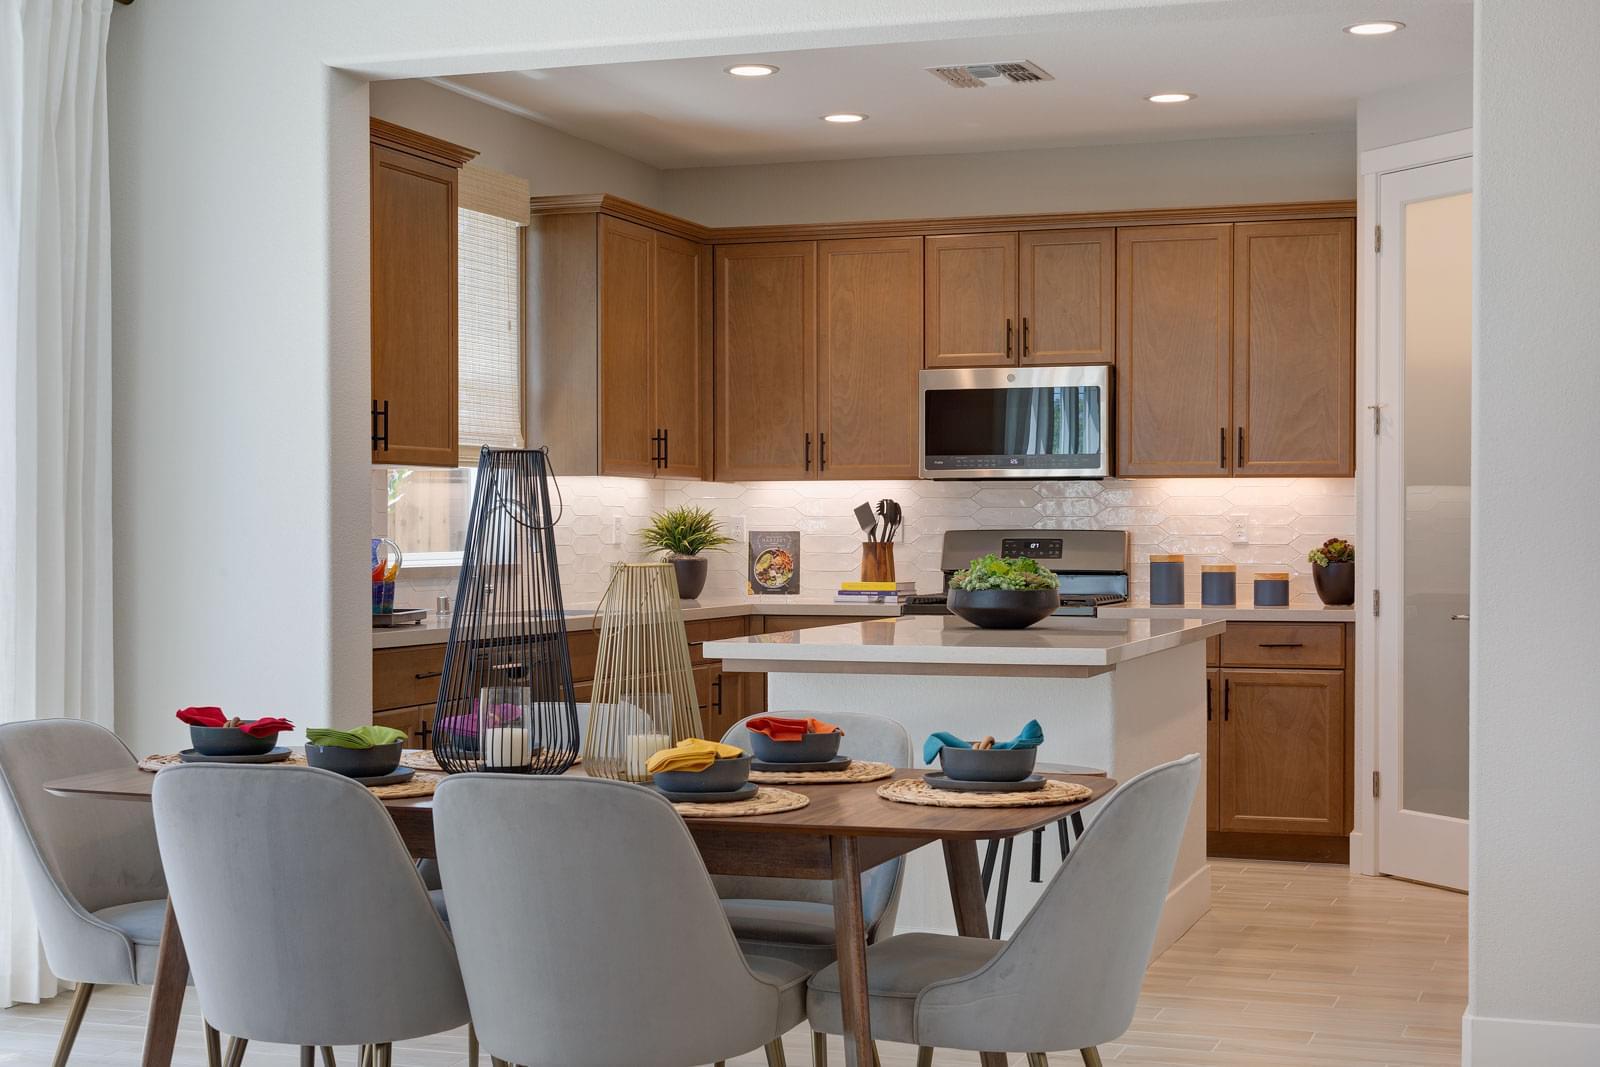 Residence 4 Kitchen